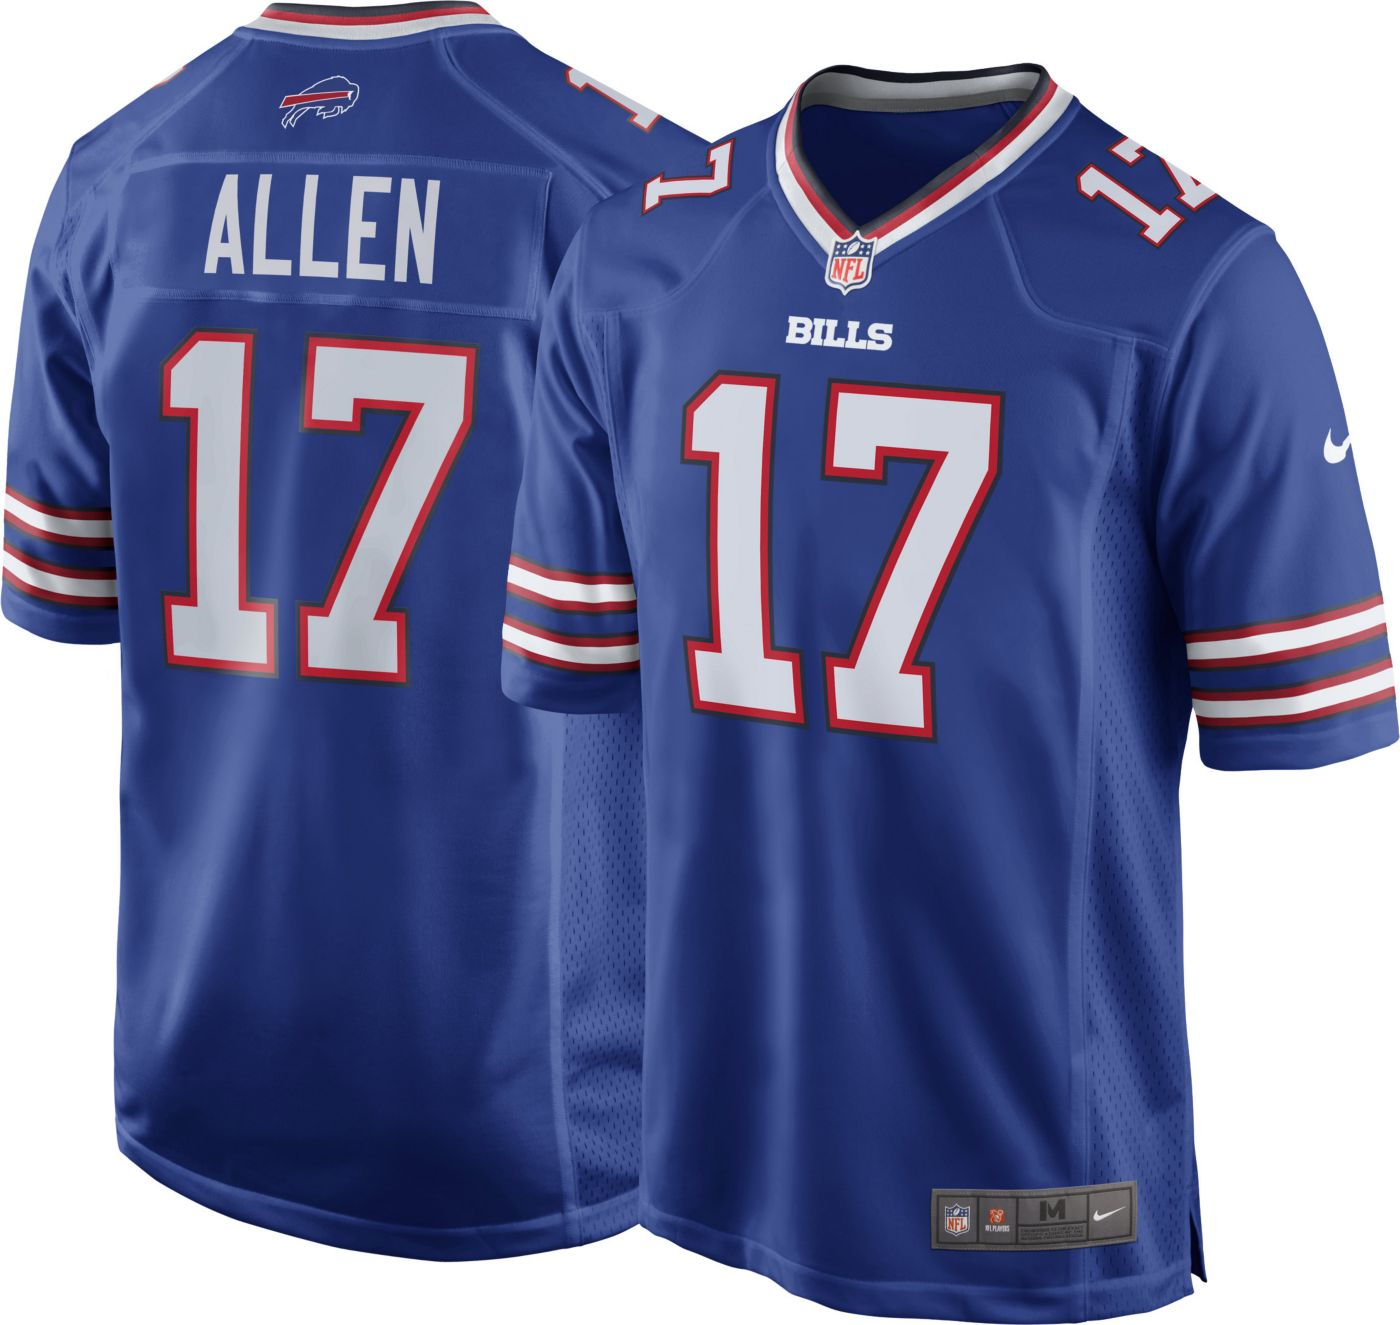 Josh Allen #17 Nike Men's Buffalo Bills Home Game Jersey